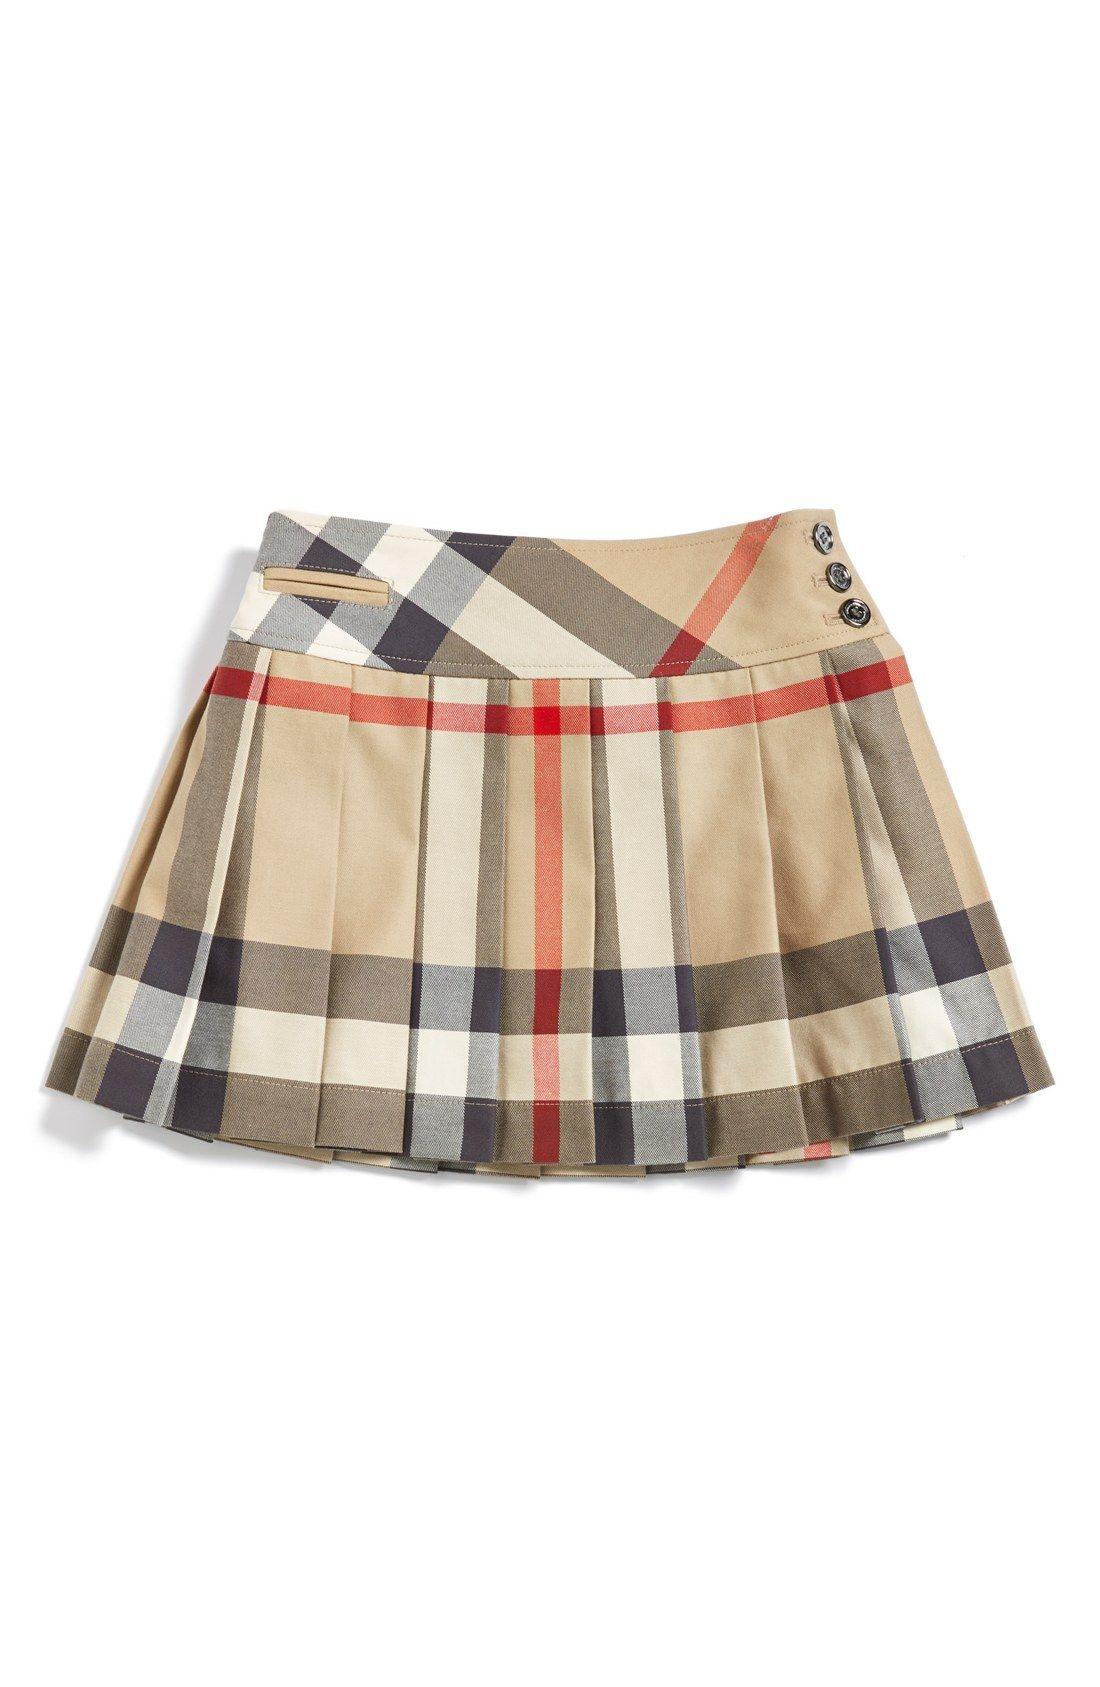 ea3d765c75 Burberry Check Print Skirt (Little Girls & Big Girls)   My Style ...